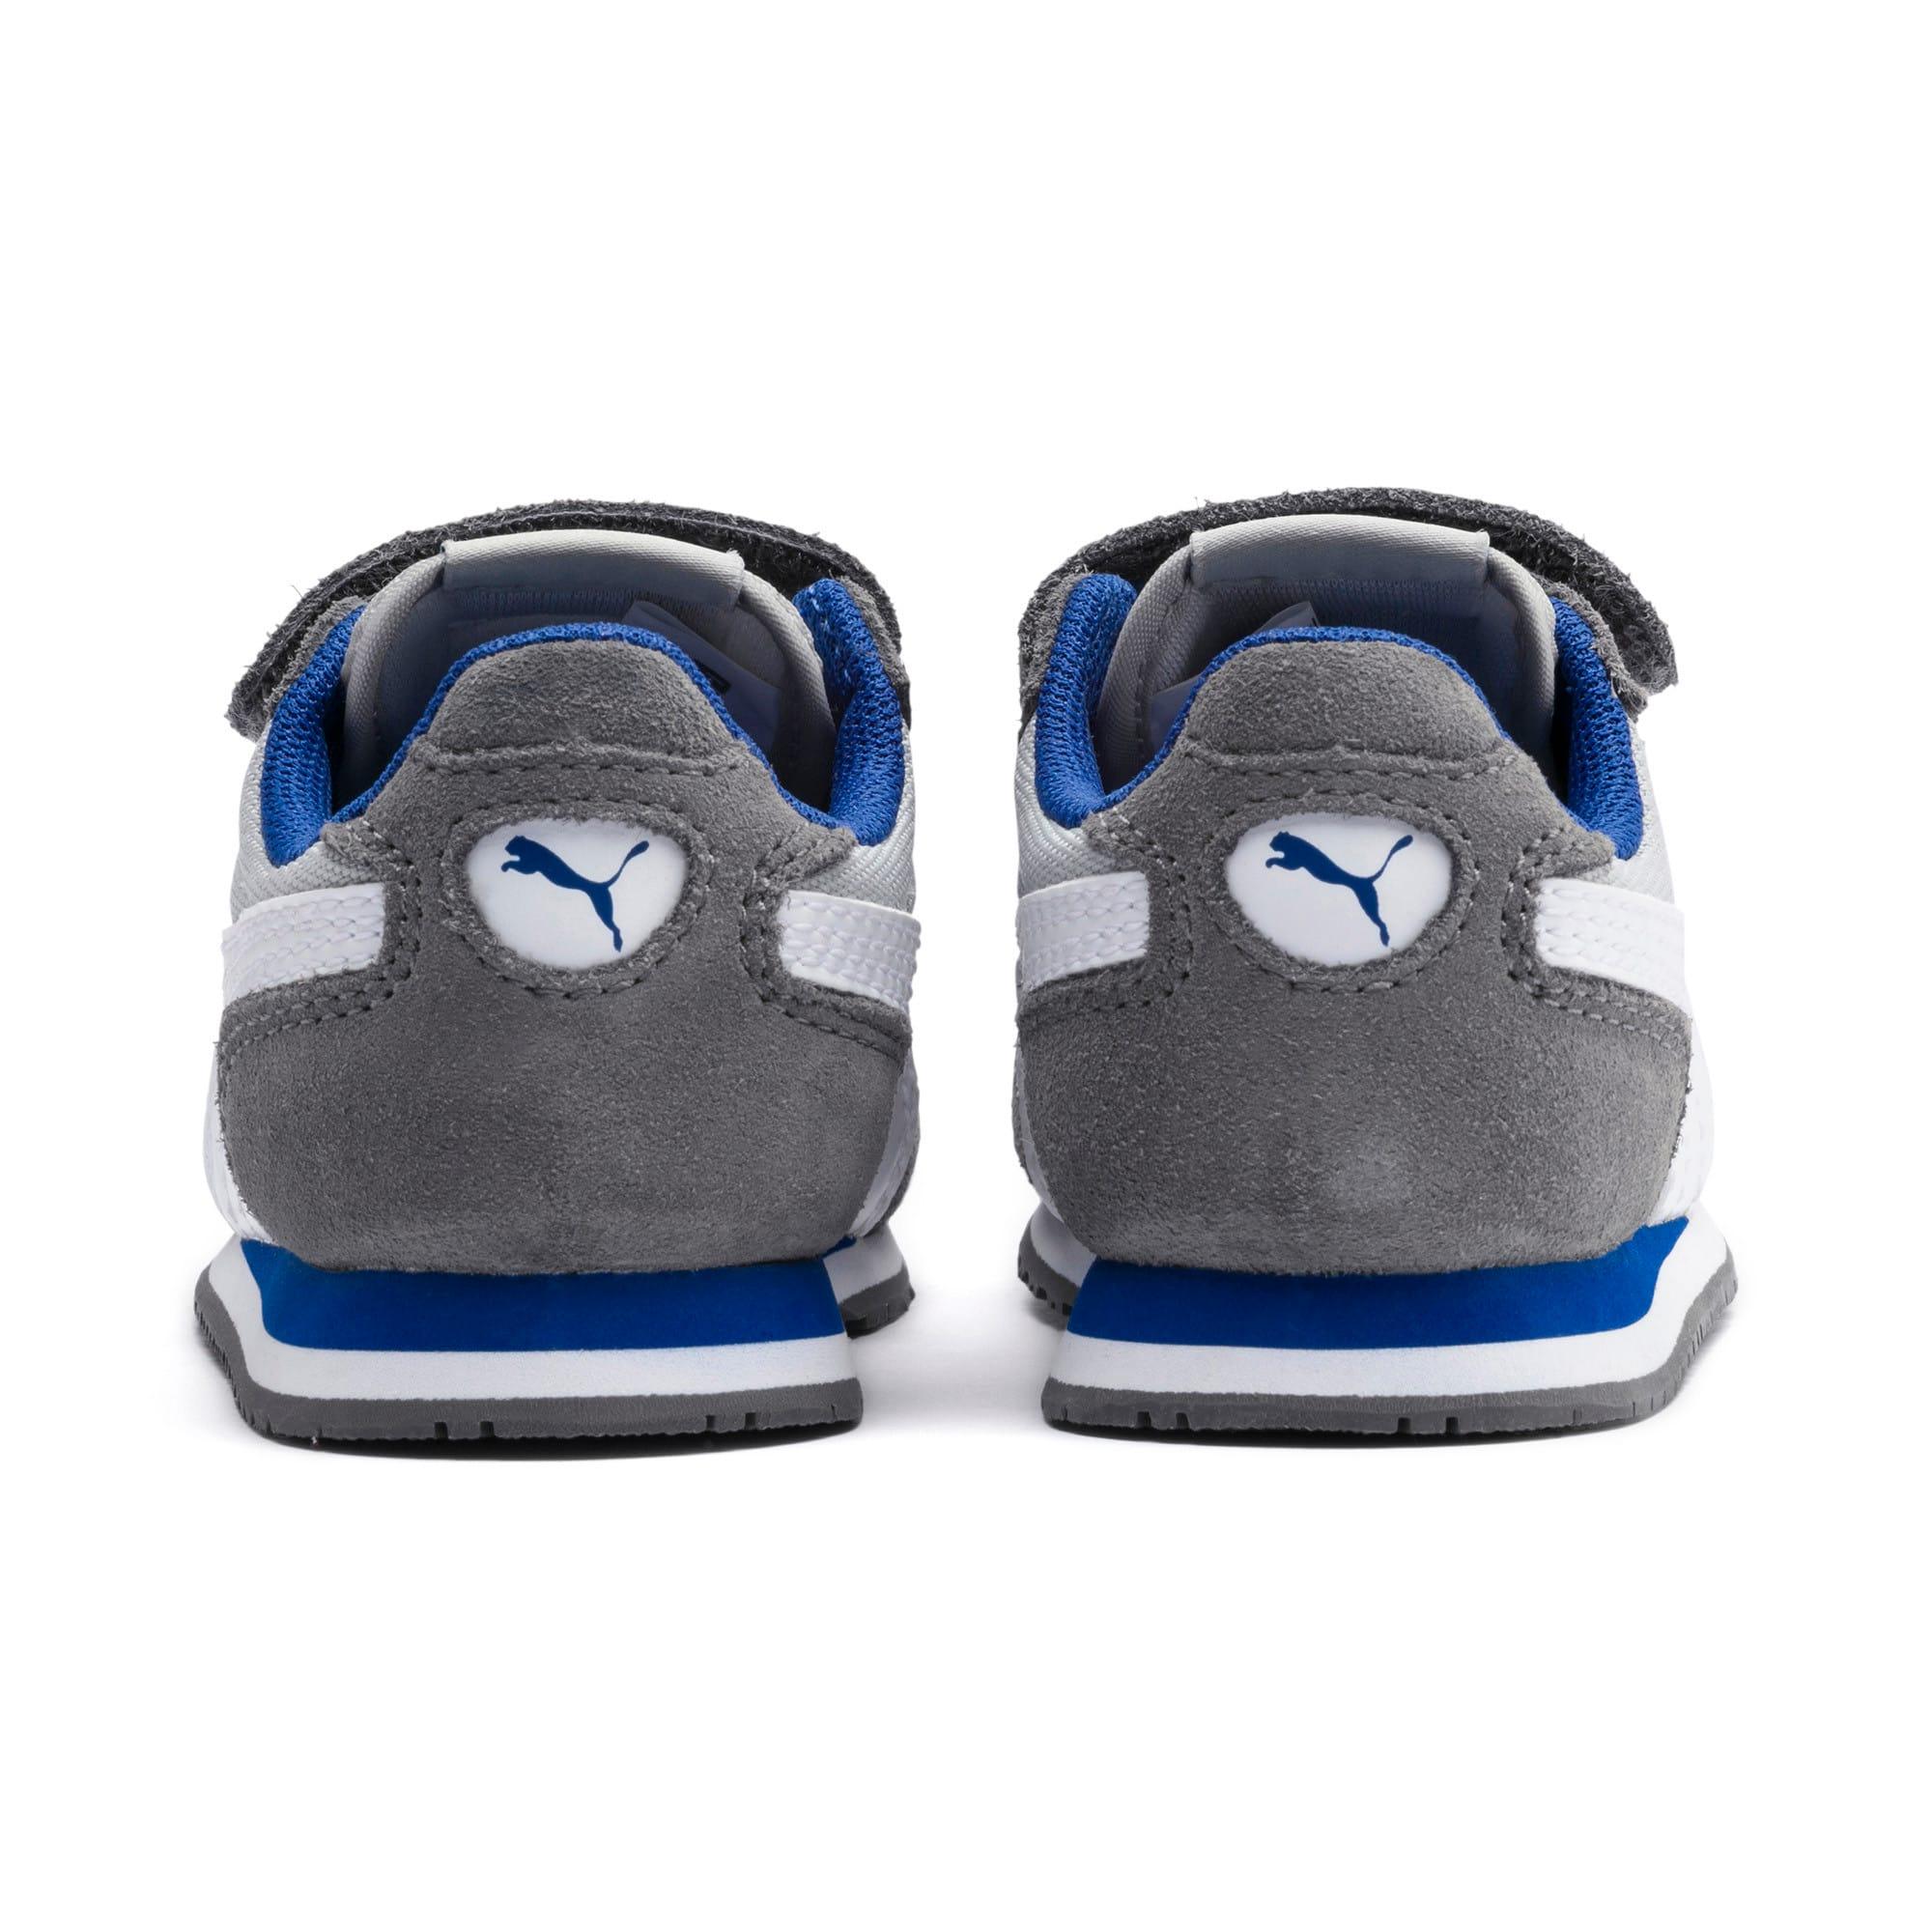 Thumbnail 3 of Cabana Racer Toddler Shoes, High Rise-CASTLEROCK, medium